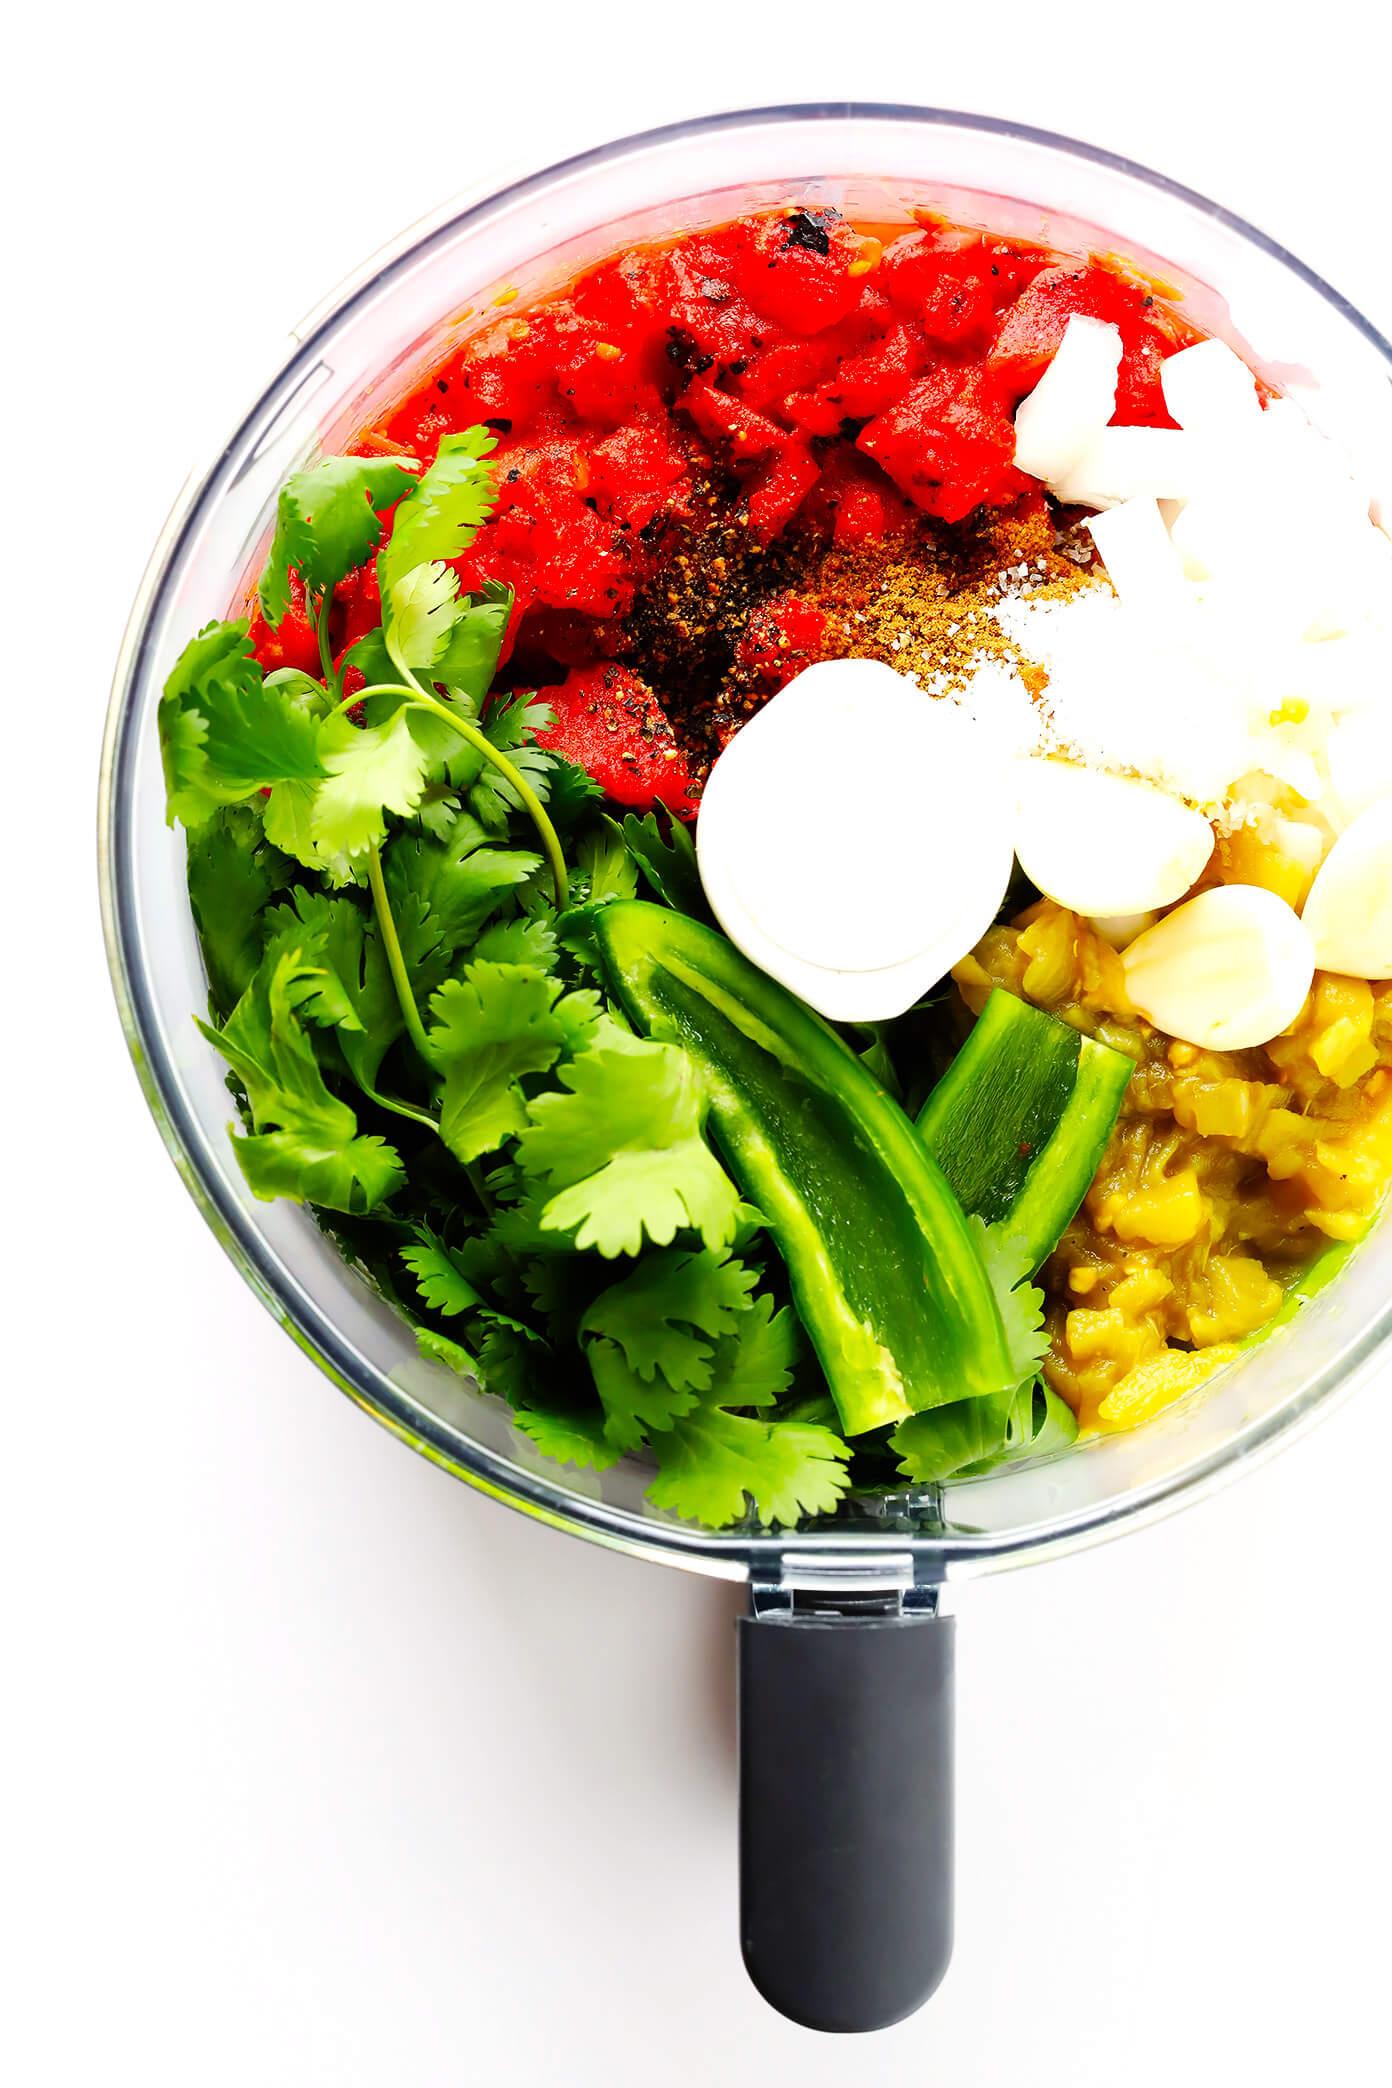 Restaurant-Style Salsa Ingredient in Food Processor